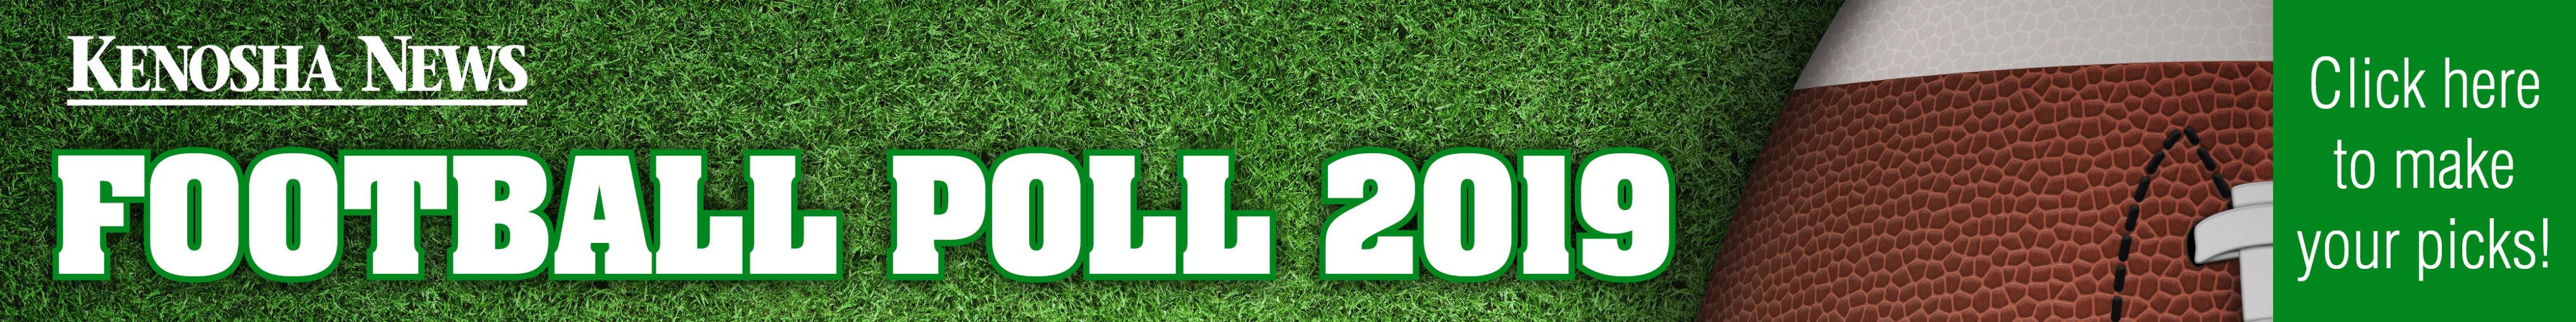 Kenosha News 2019 Football Poll